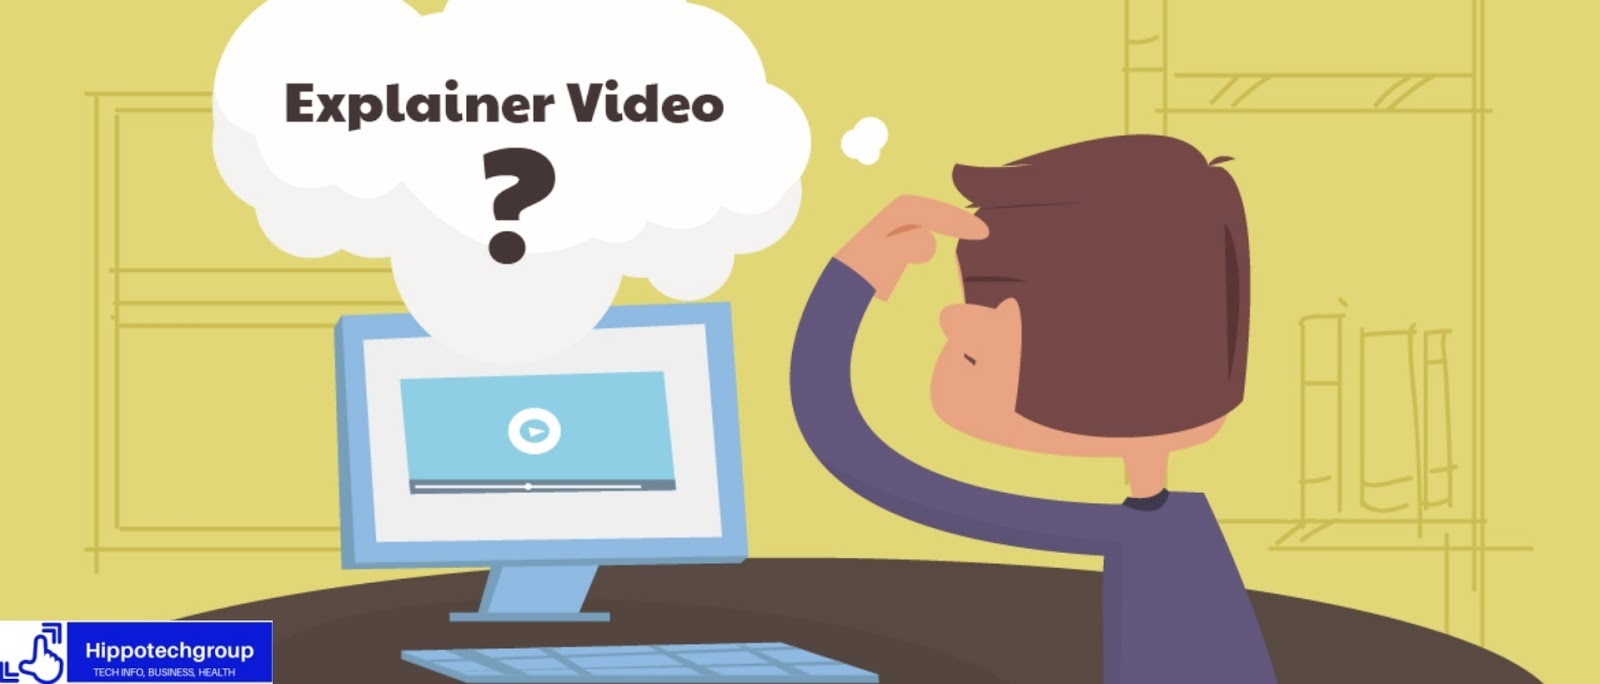 10 Ways Explainer Videos Can Boost Digital Marketing (SEO)